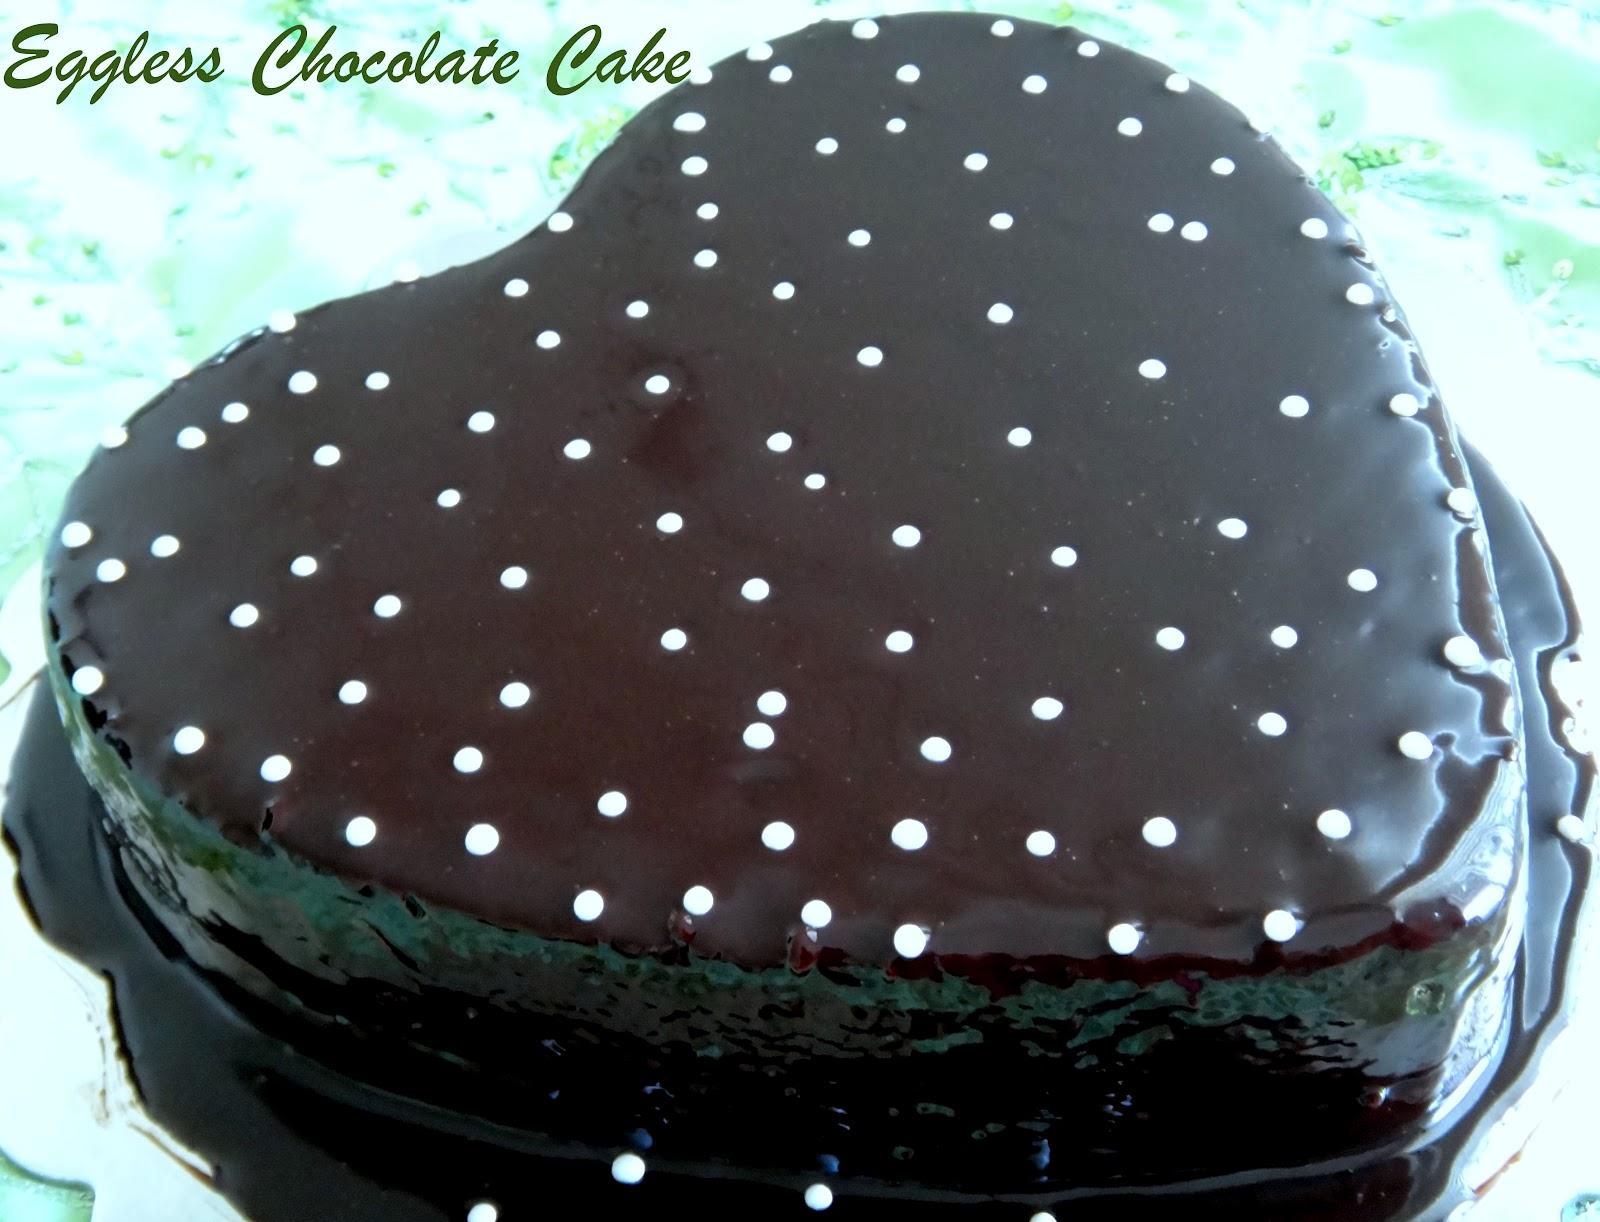 Cake Icing Recipe Joy Of Baking: Prabha's Cooking: Eggless Chocolate Cake~With Chocolate